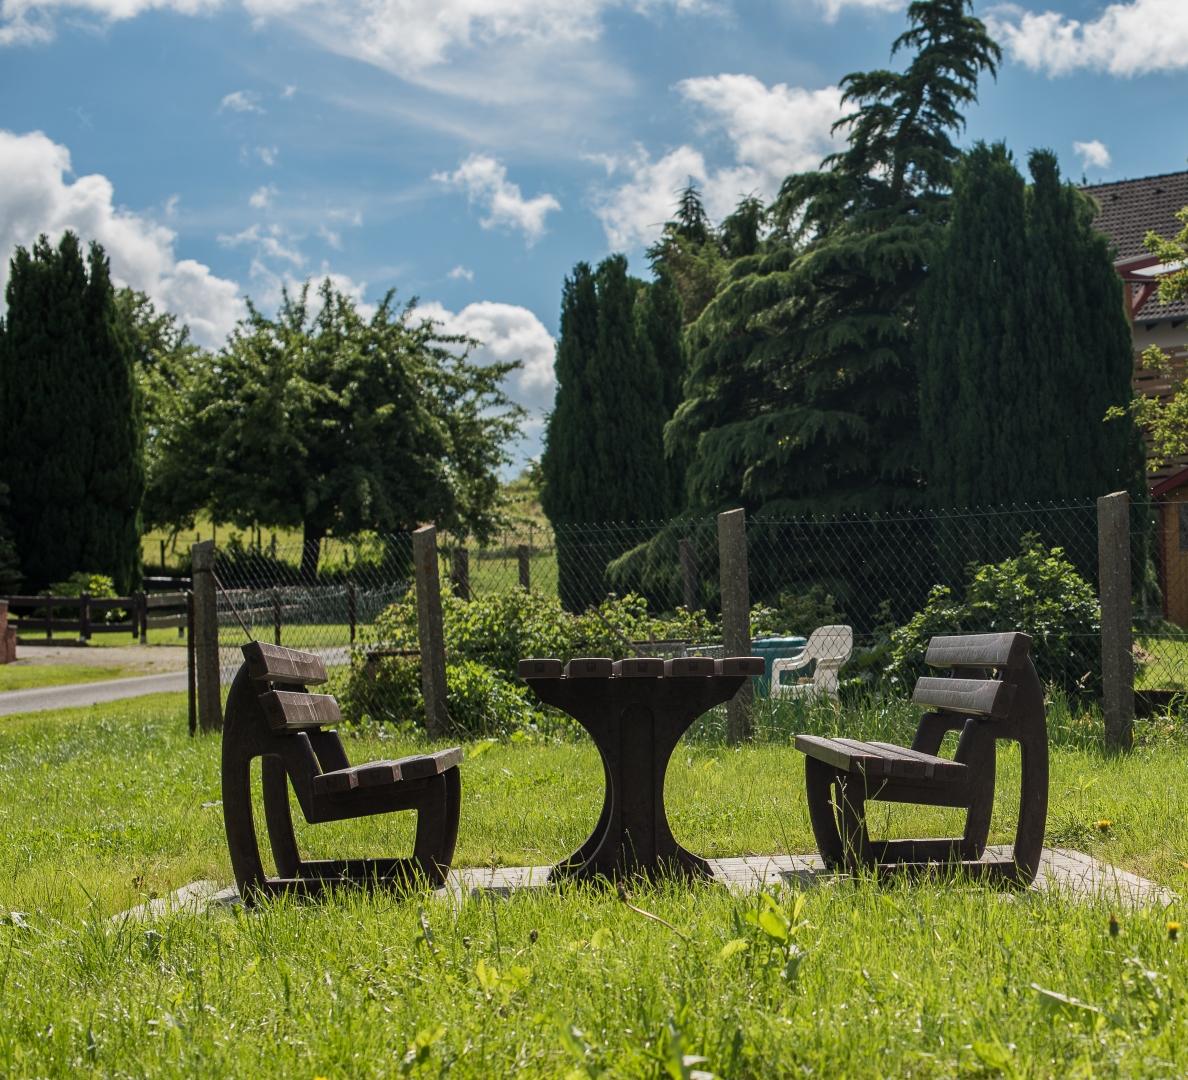 Sitzplatz am Ehrenmal